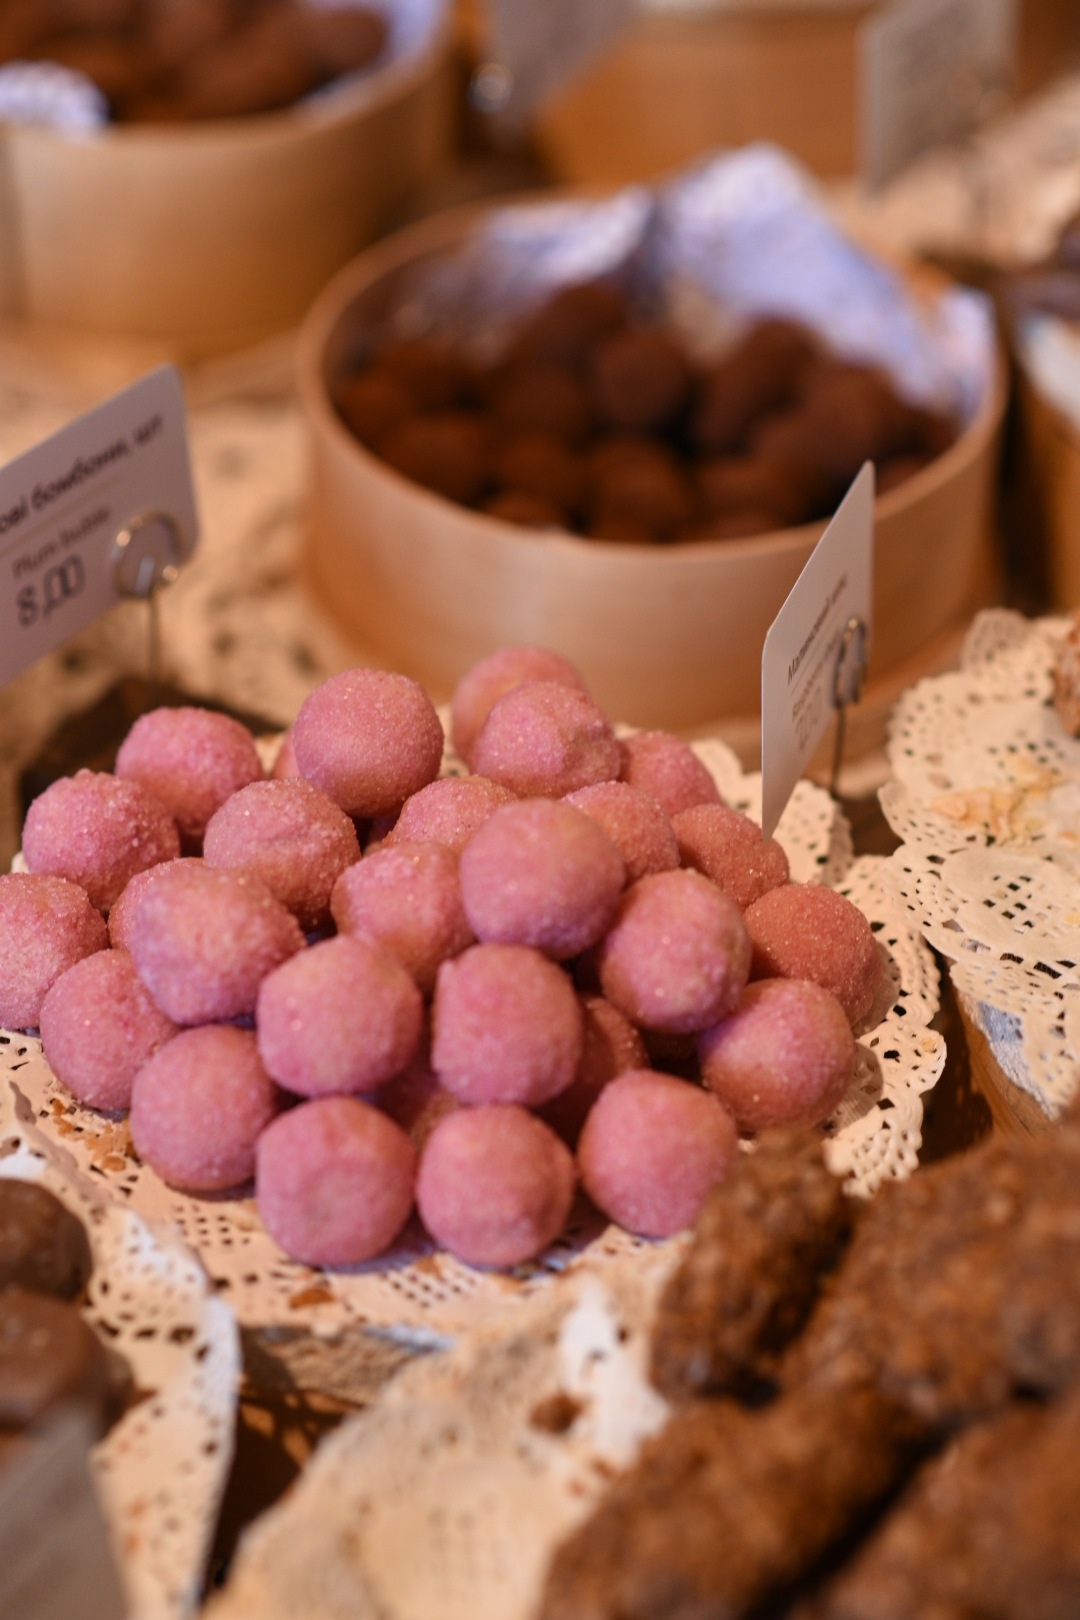 Chocolate 56! by Memed Bayatli